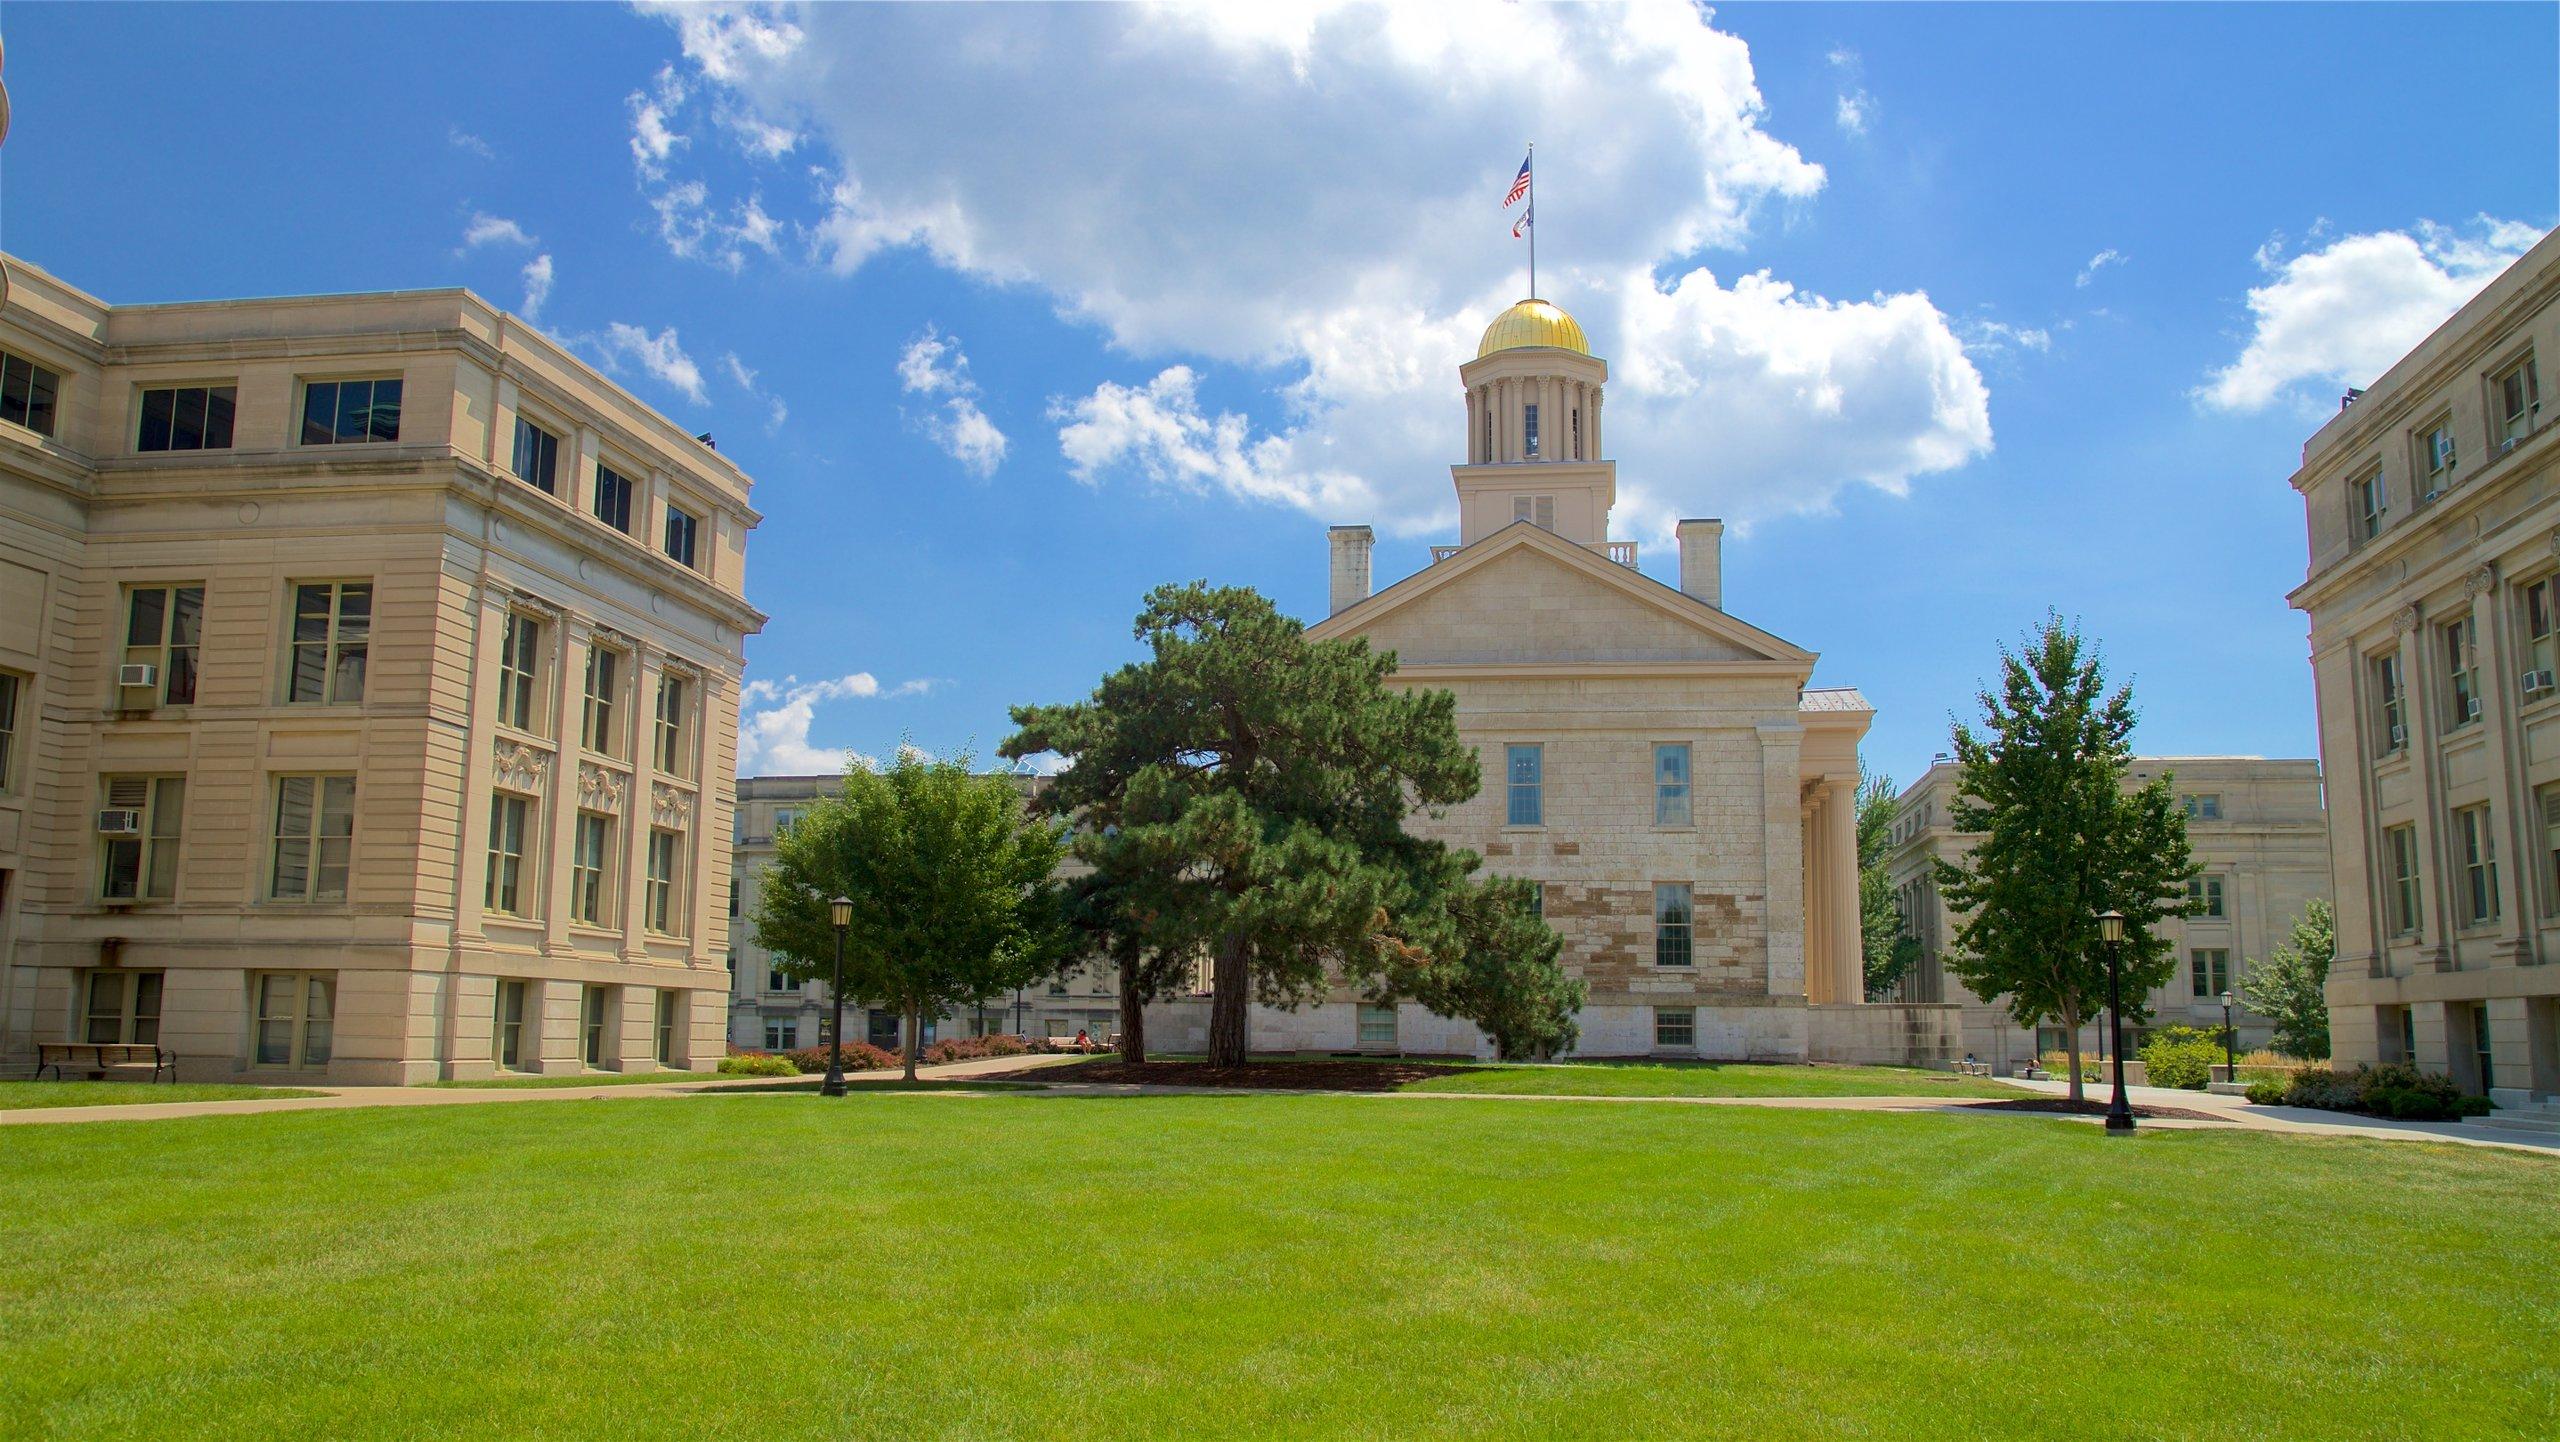 Old Capitol Museum, Iowa City, Iowa, United States of America